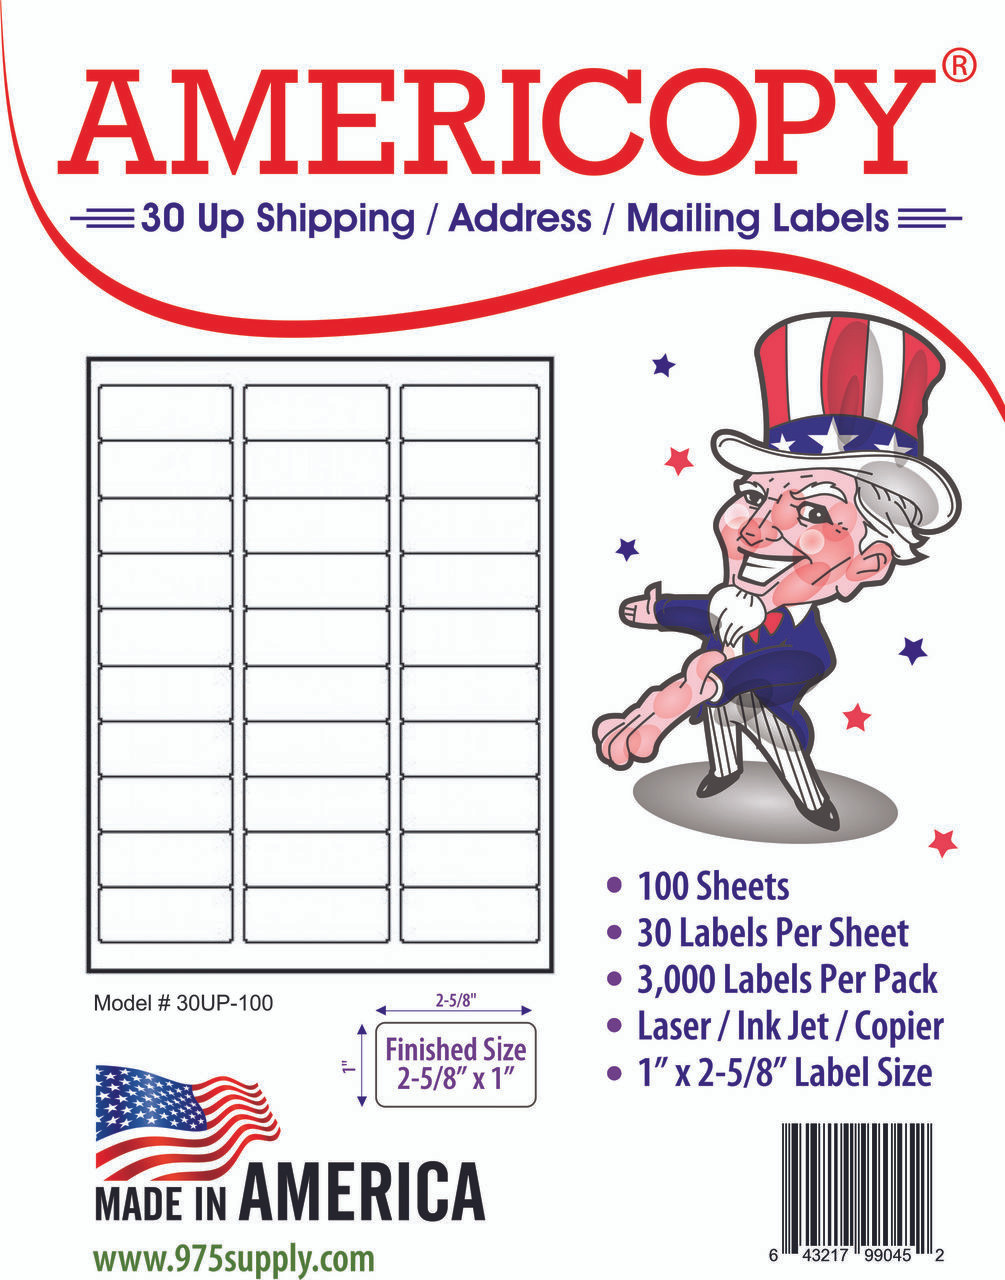 americopy labels 30 up labels 1 x 2 5 8 30 labels per sheet